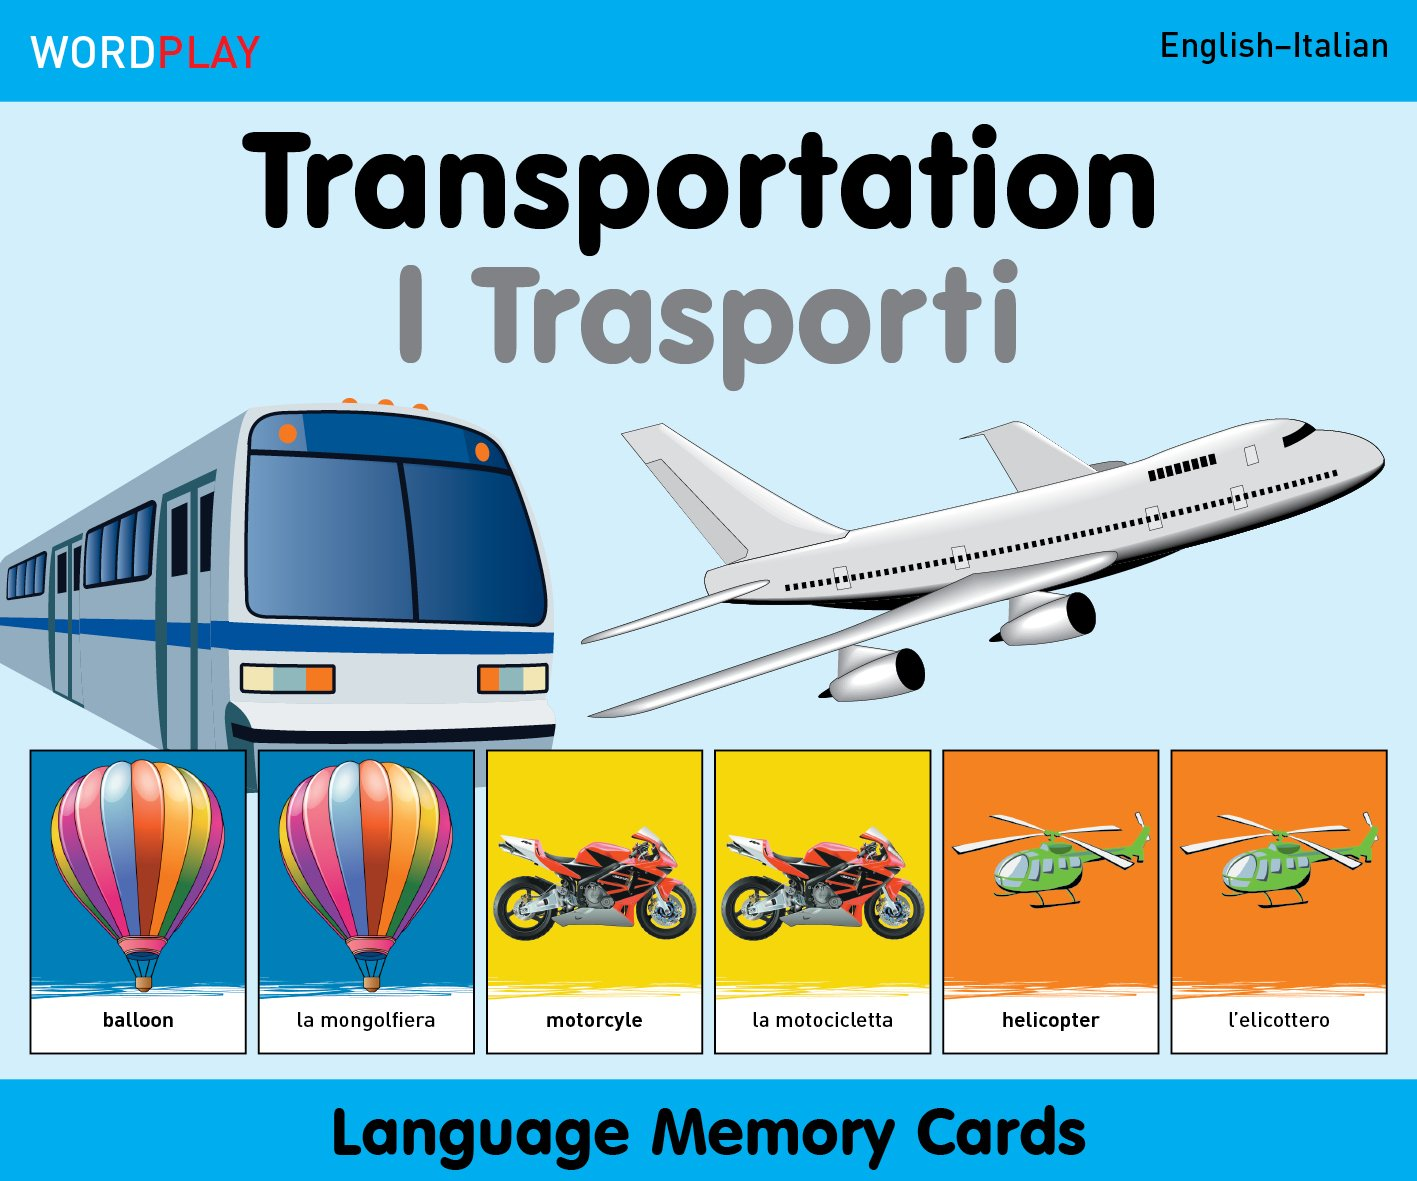 WordPlay Language Memory Cards–Transportation (English–Italian) (Italian and English Edition) by Milet Publishing